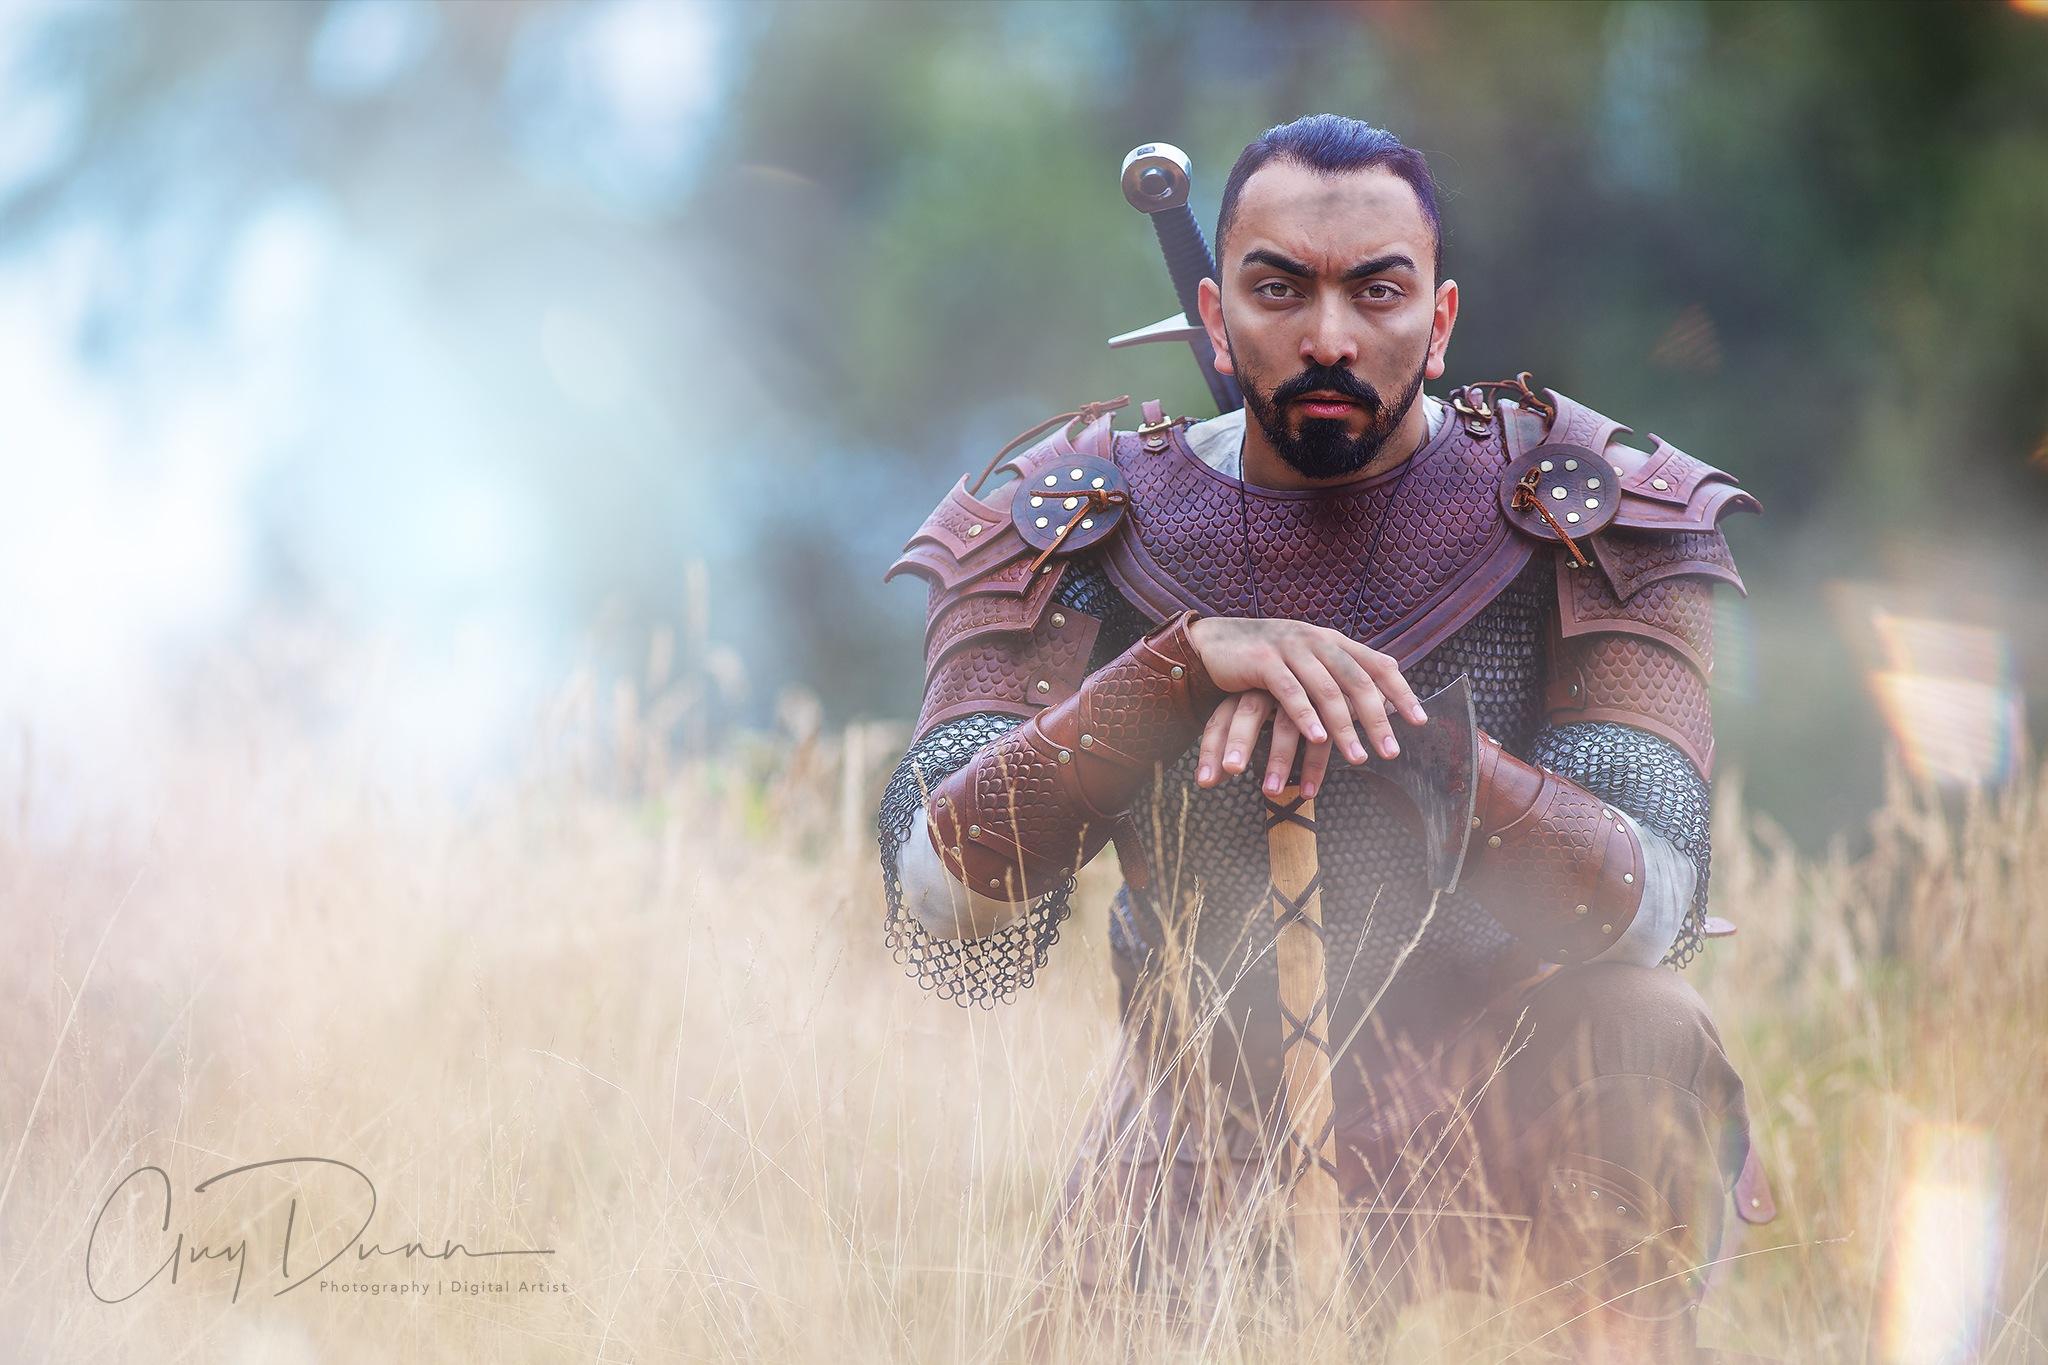 The Vikings by Guy Dunn